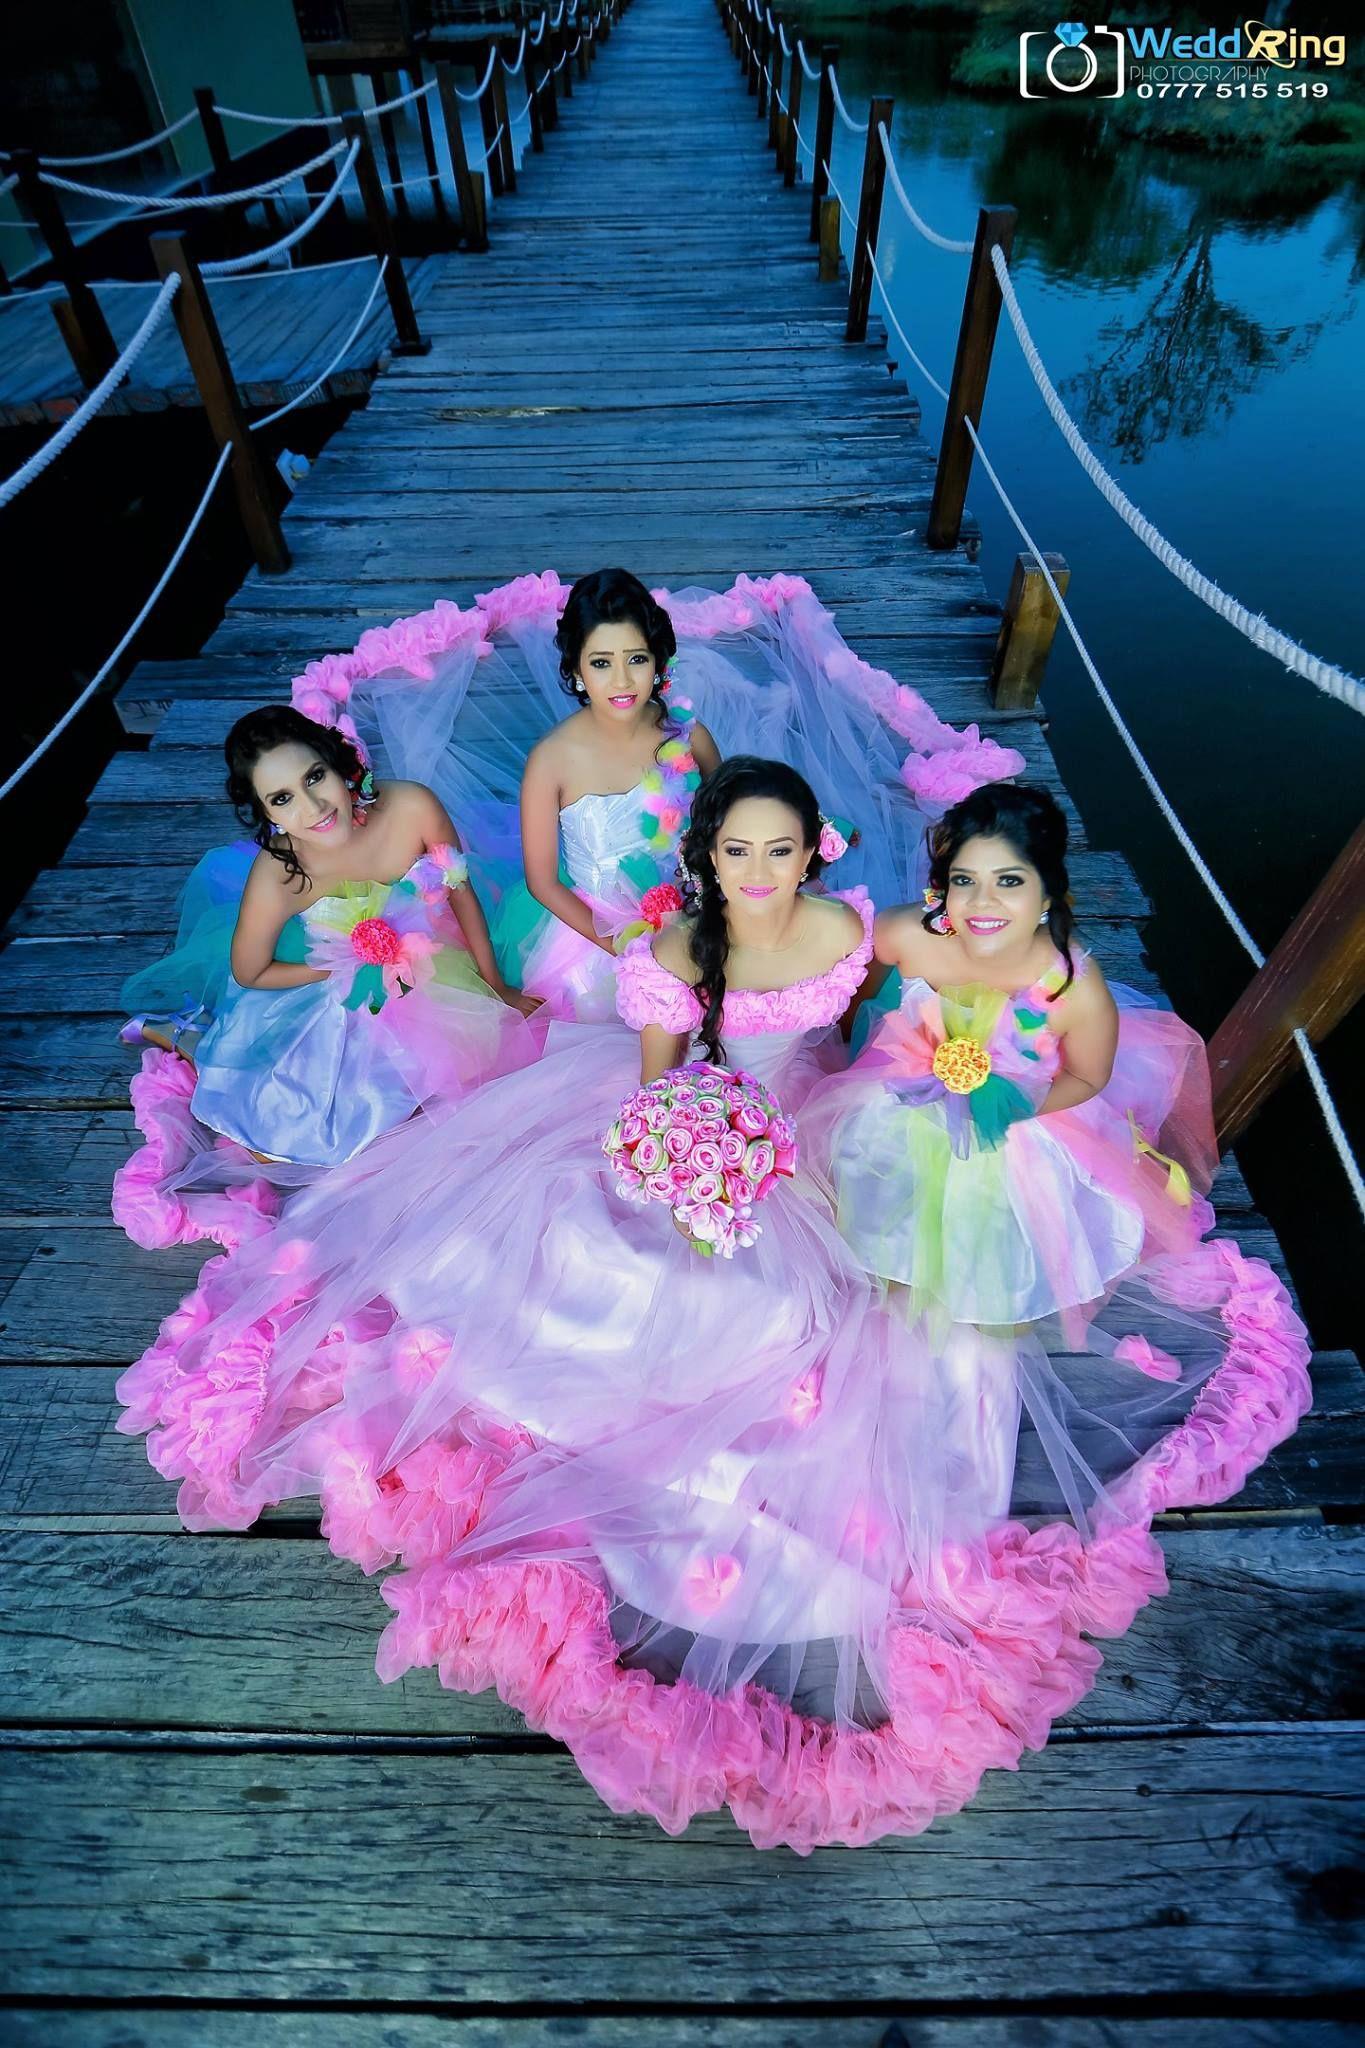 Malsha Ravihari | Sri Lankan Brides and Bridesmaids | Pinterest ...